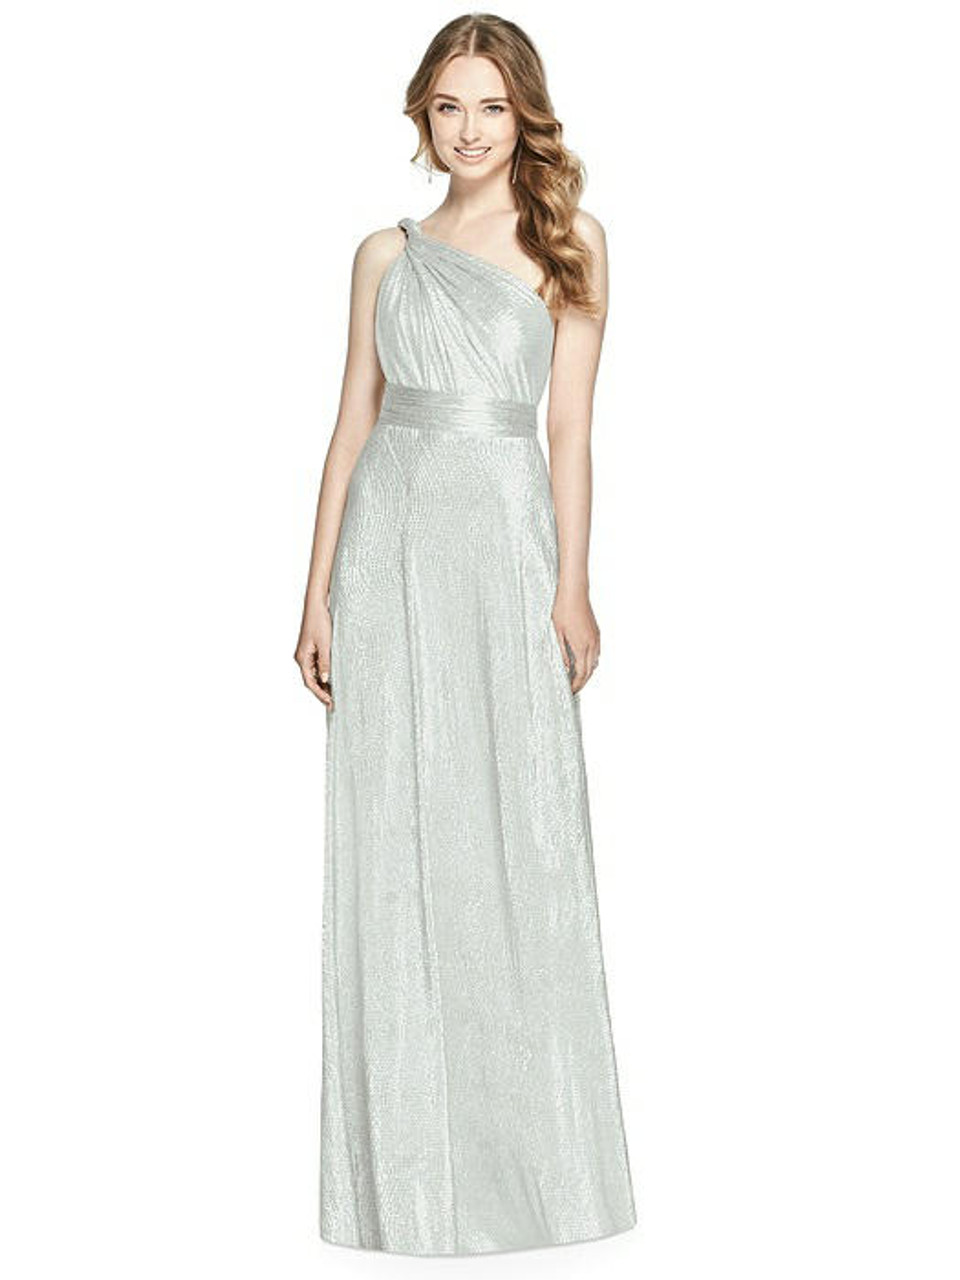 Soho Metallic Twist Dress - Silver Crush - In Stock Dress